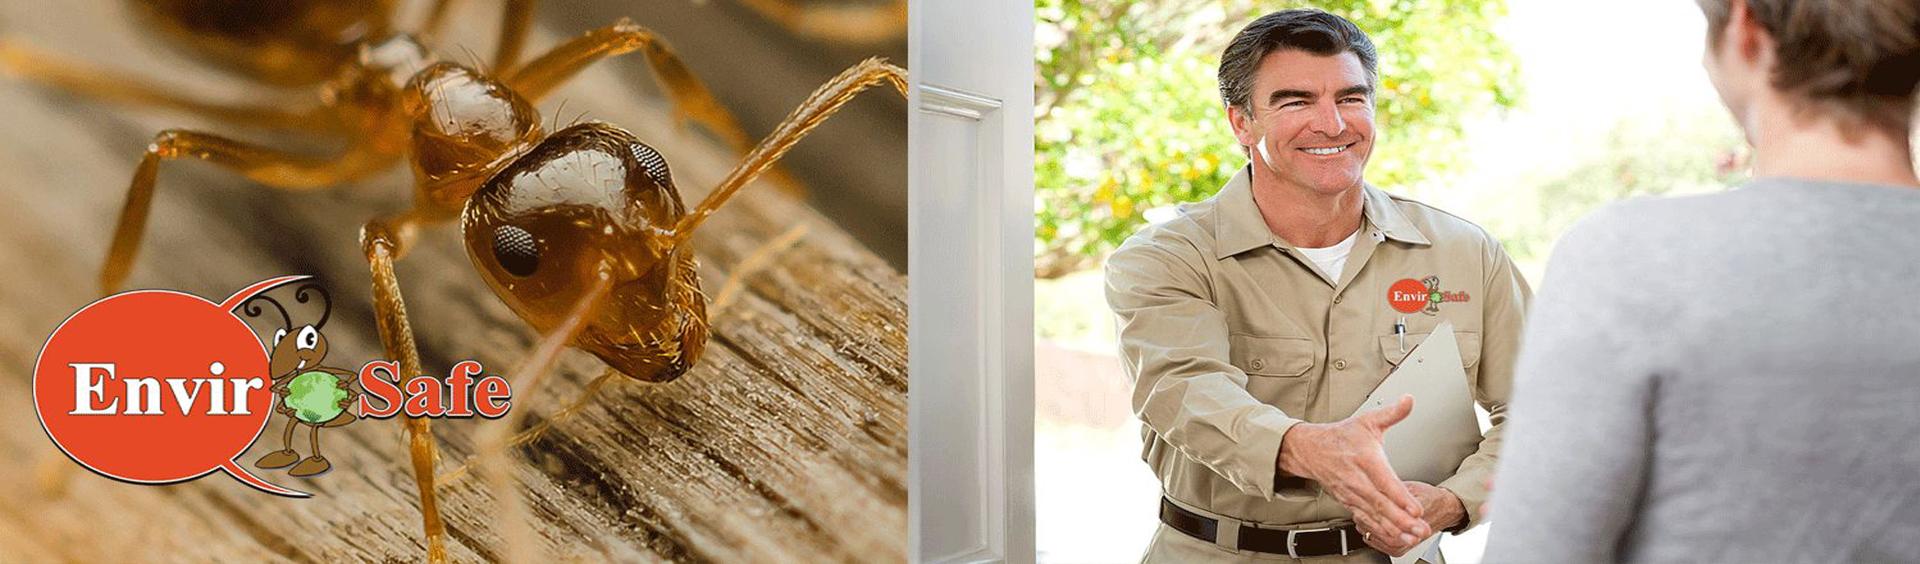 Envirosafe Pest Control of Charlotte